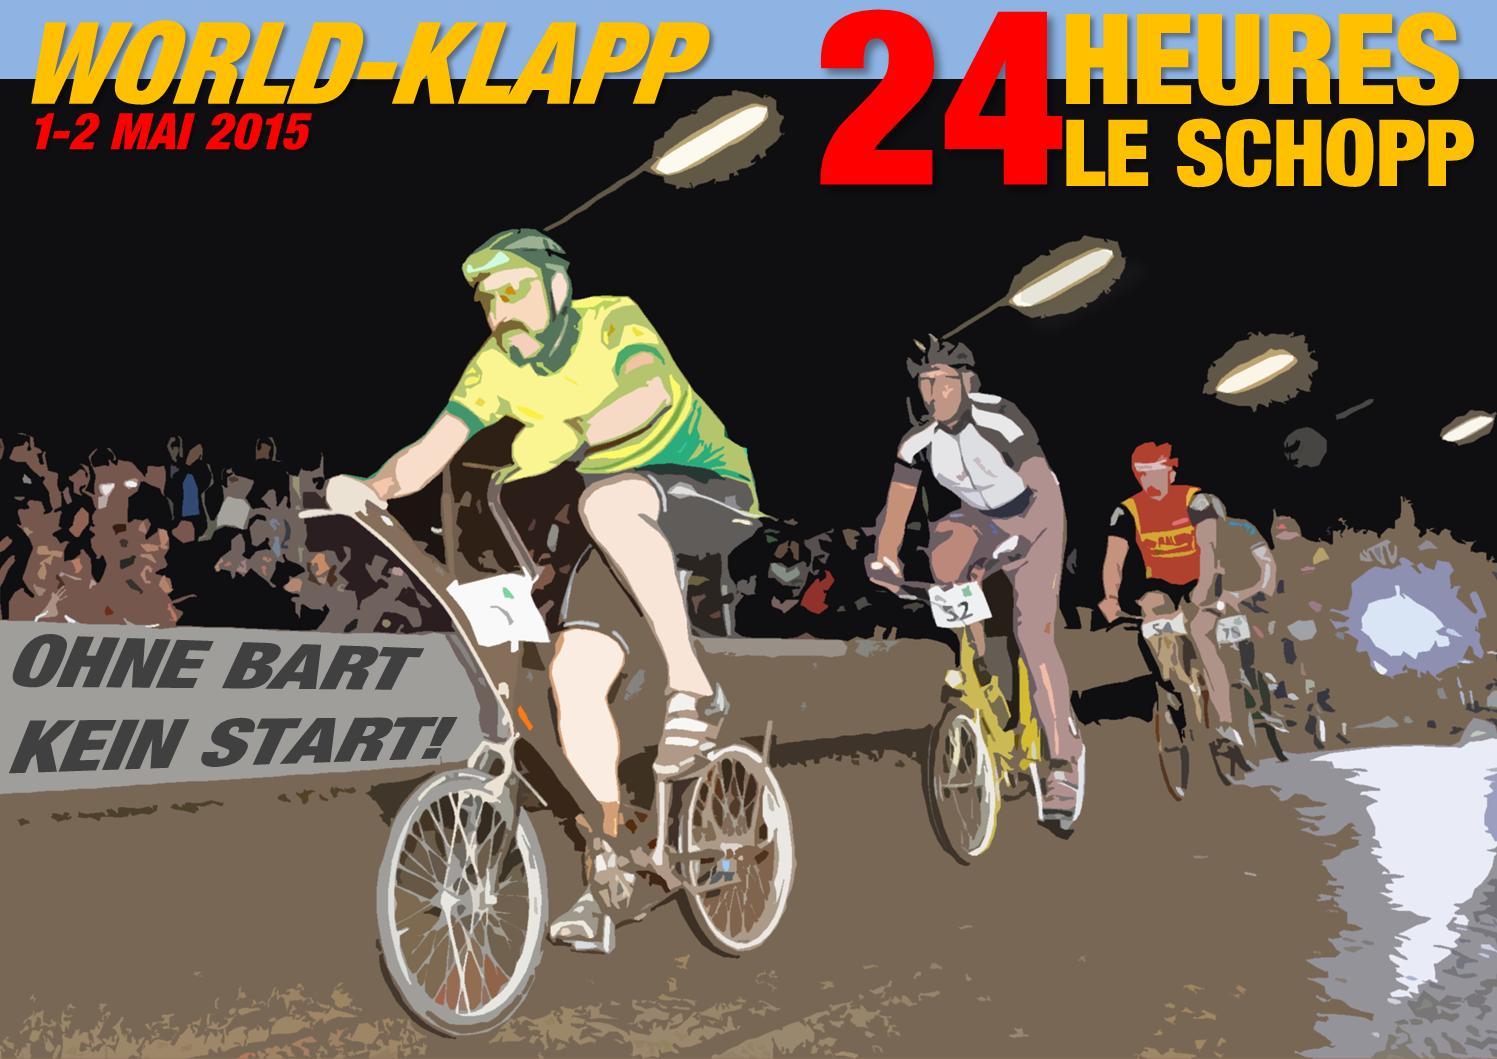 WK15 Plakat 02